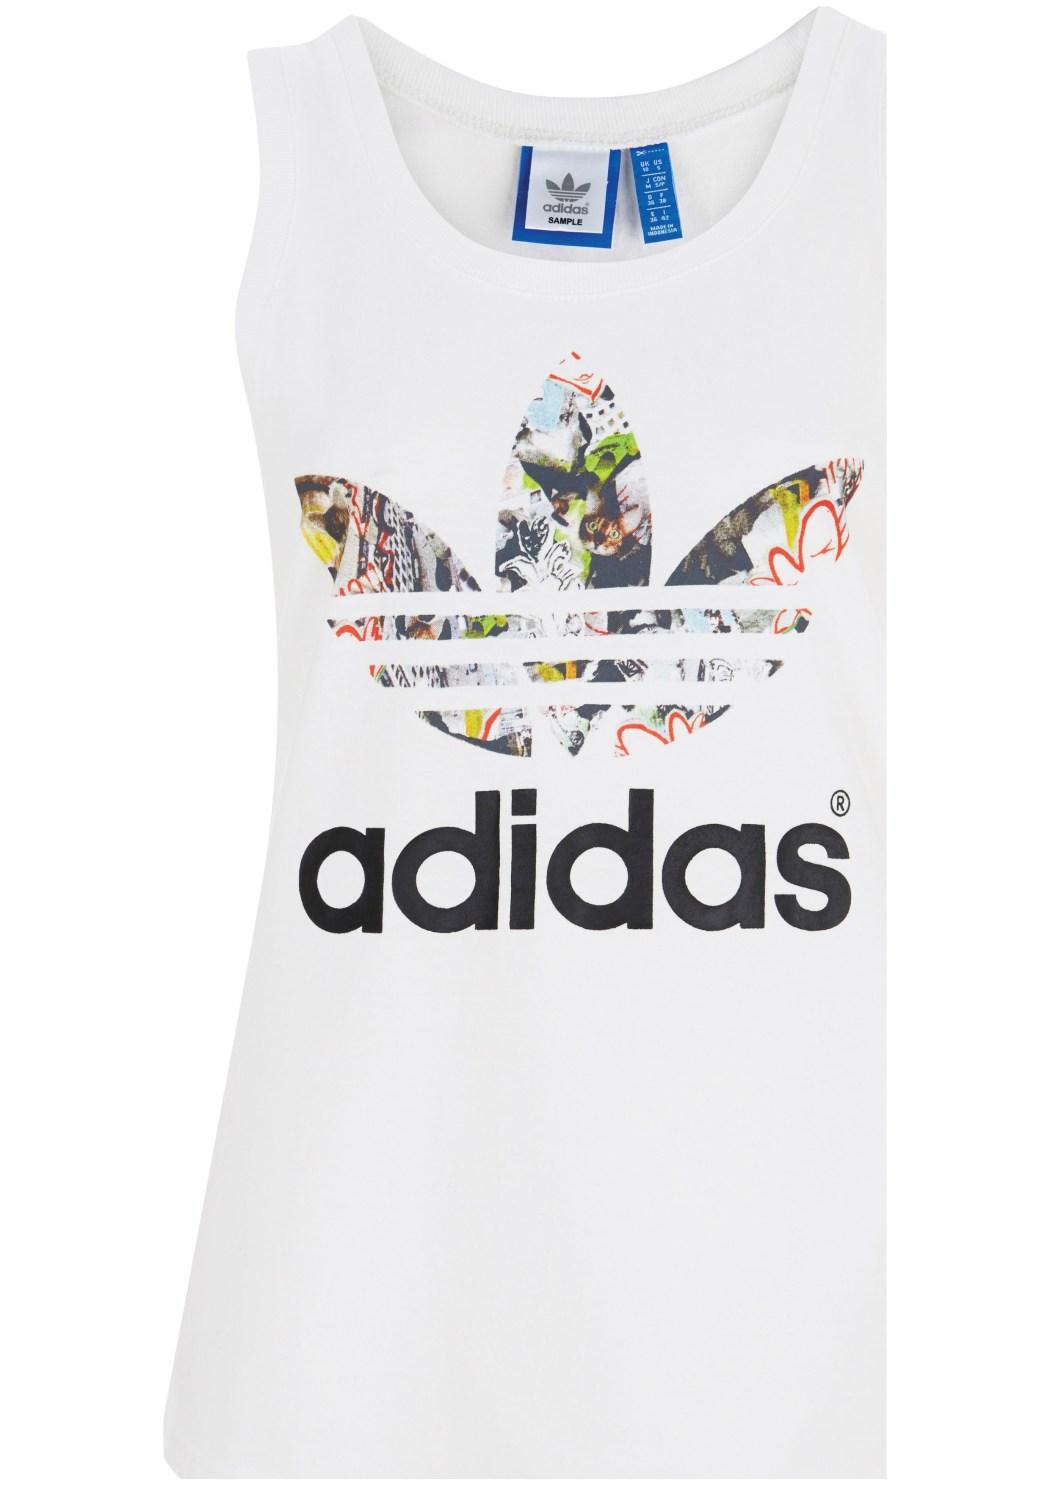 TOPSHOP X adidas Originals VENICE TANK_NTD 1,290